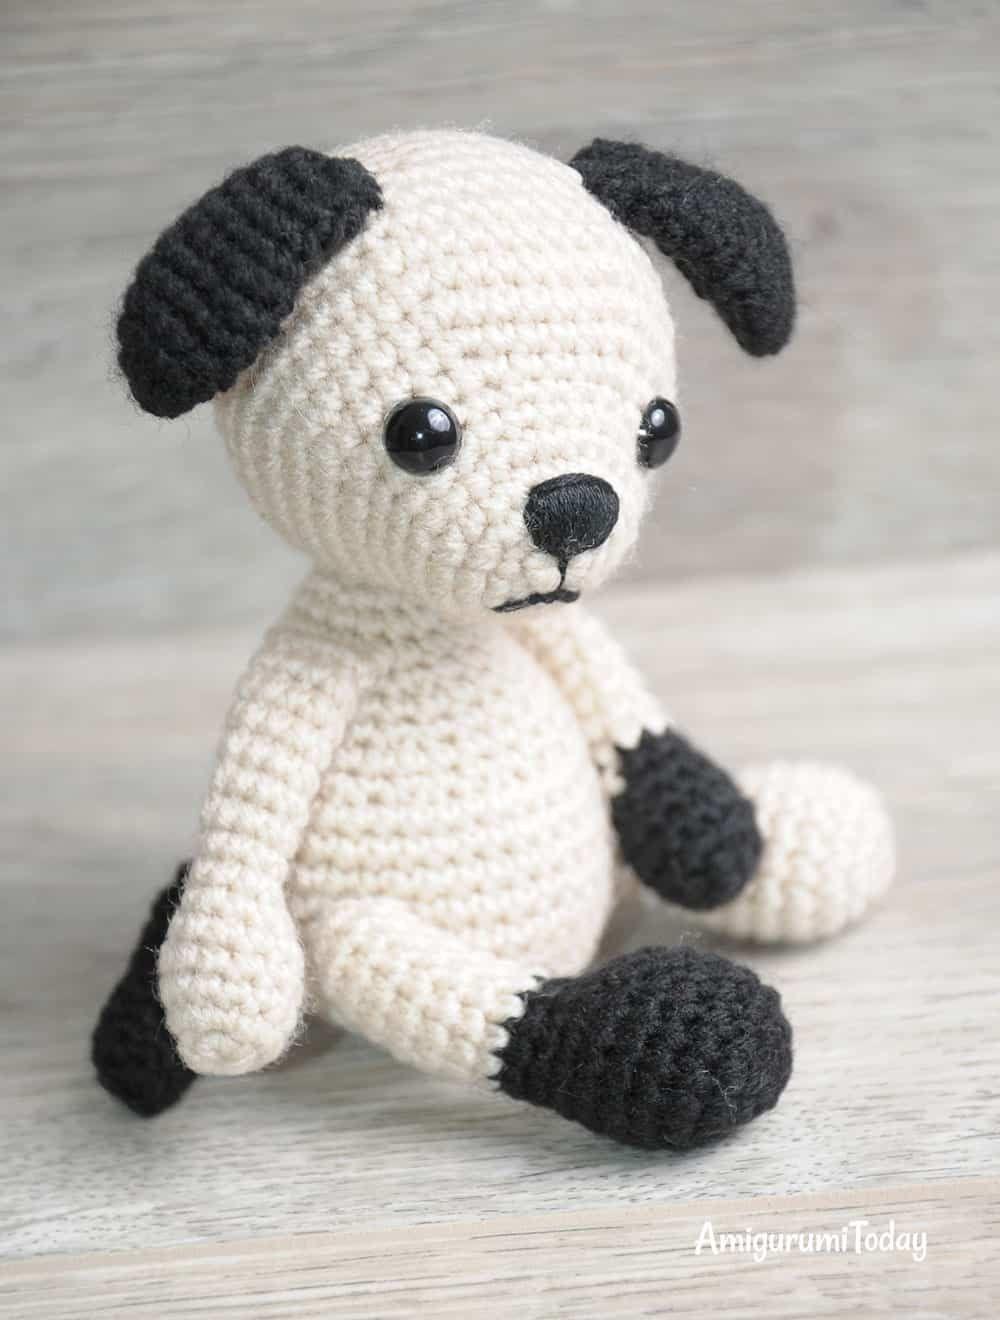 Amigurumi Tommy the Dog crochet pattern | Crochet | Pinterest ...